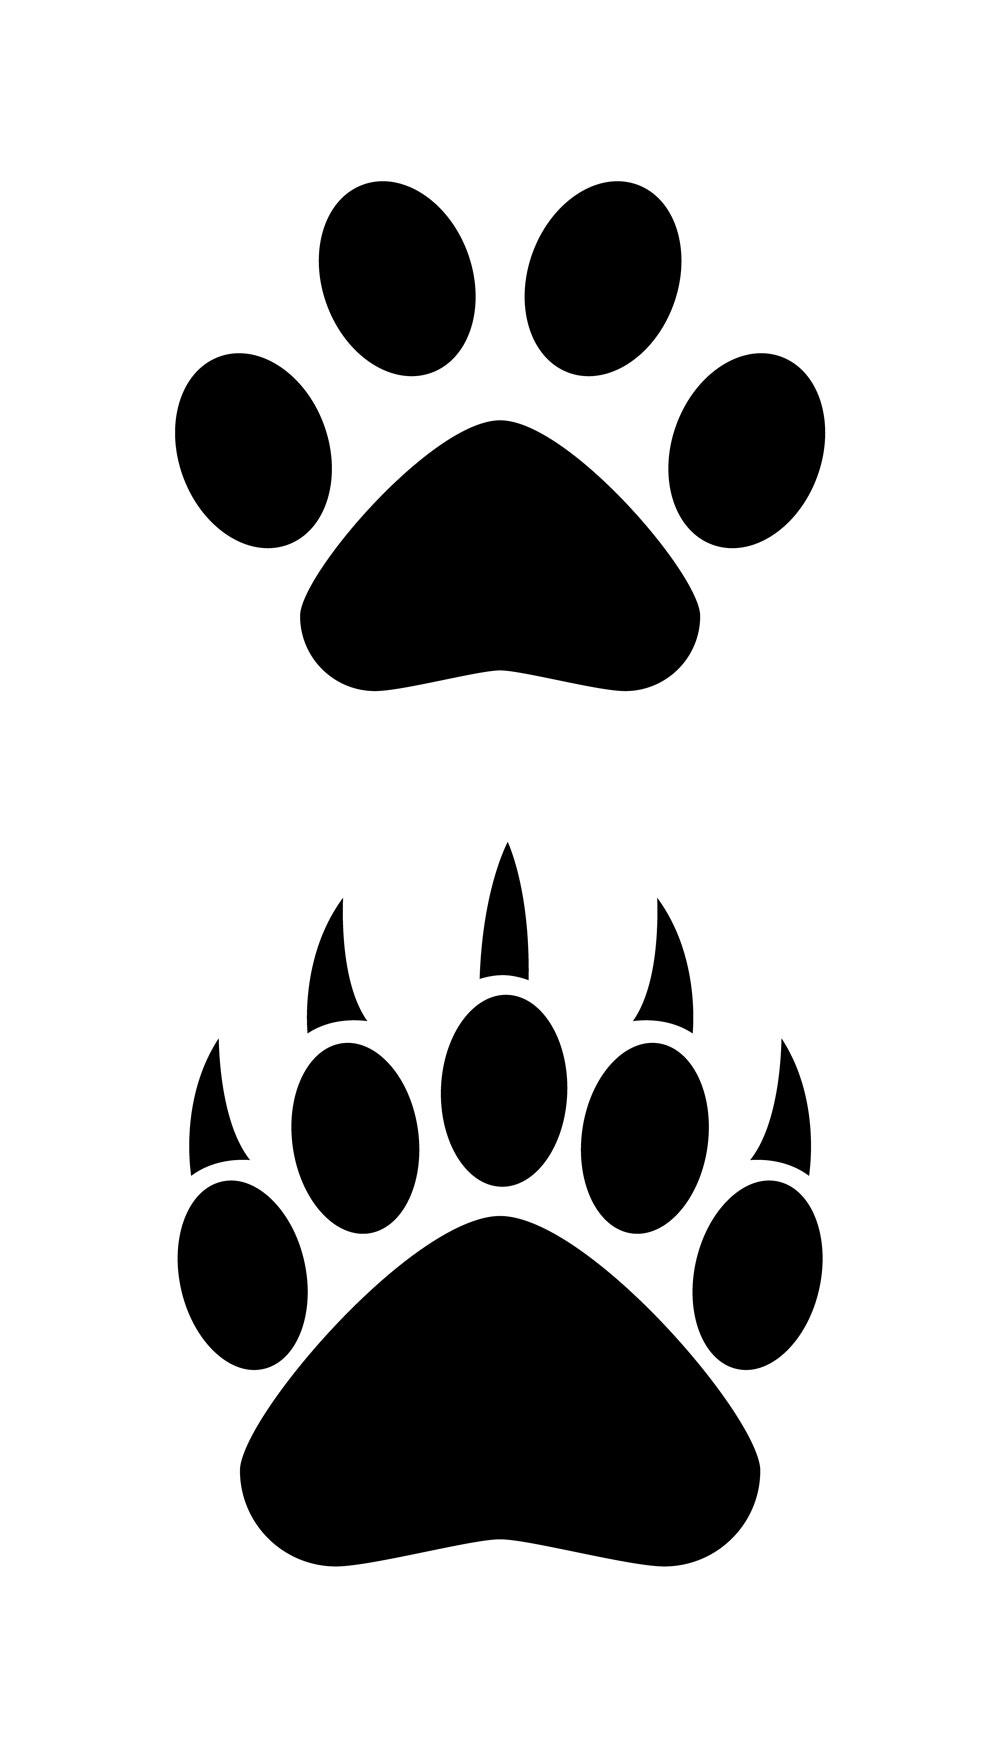 Bear paw logo clipart